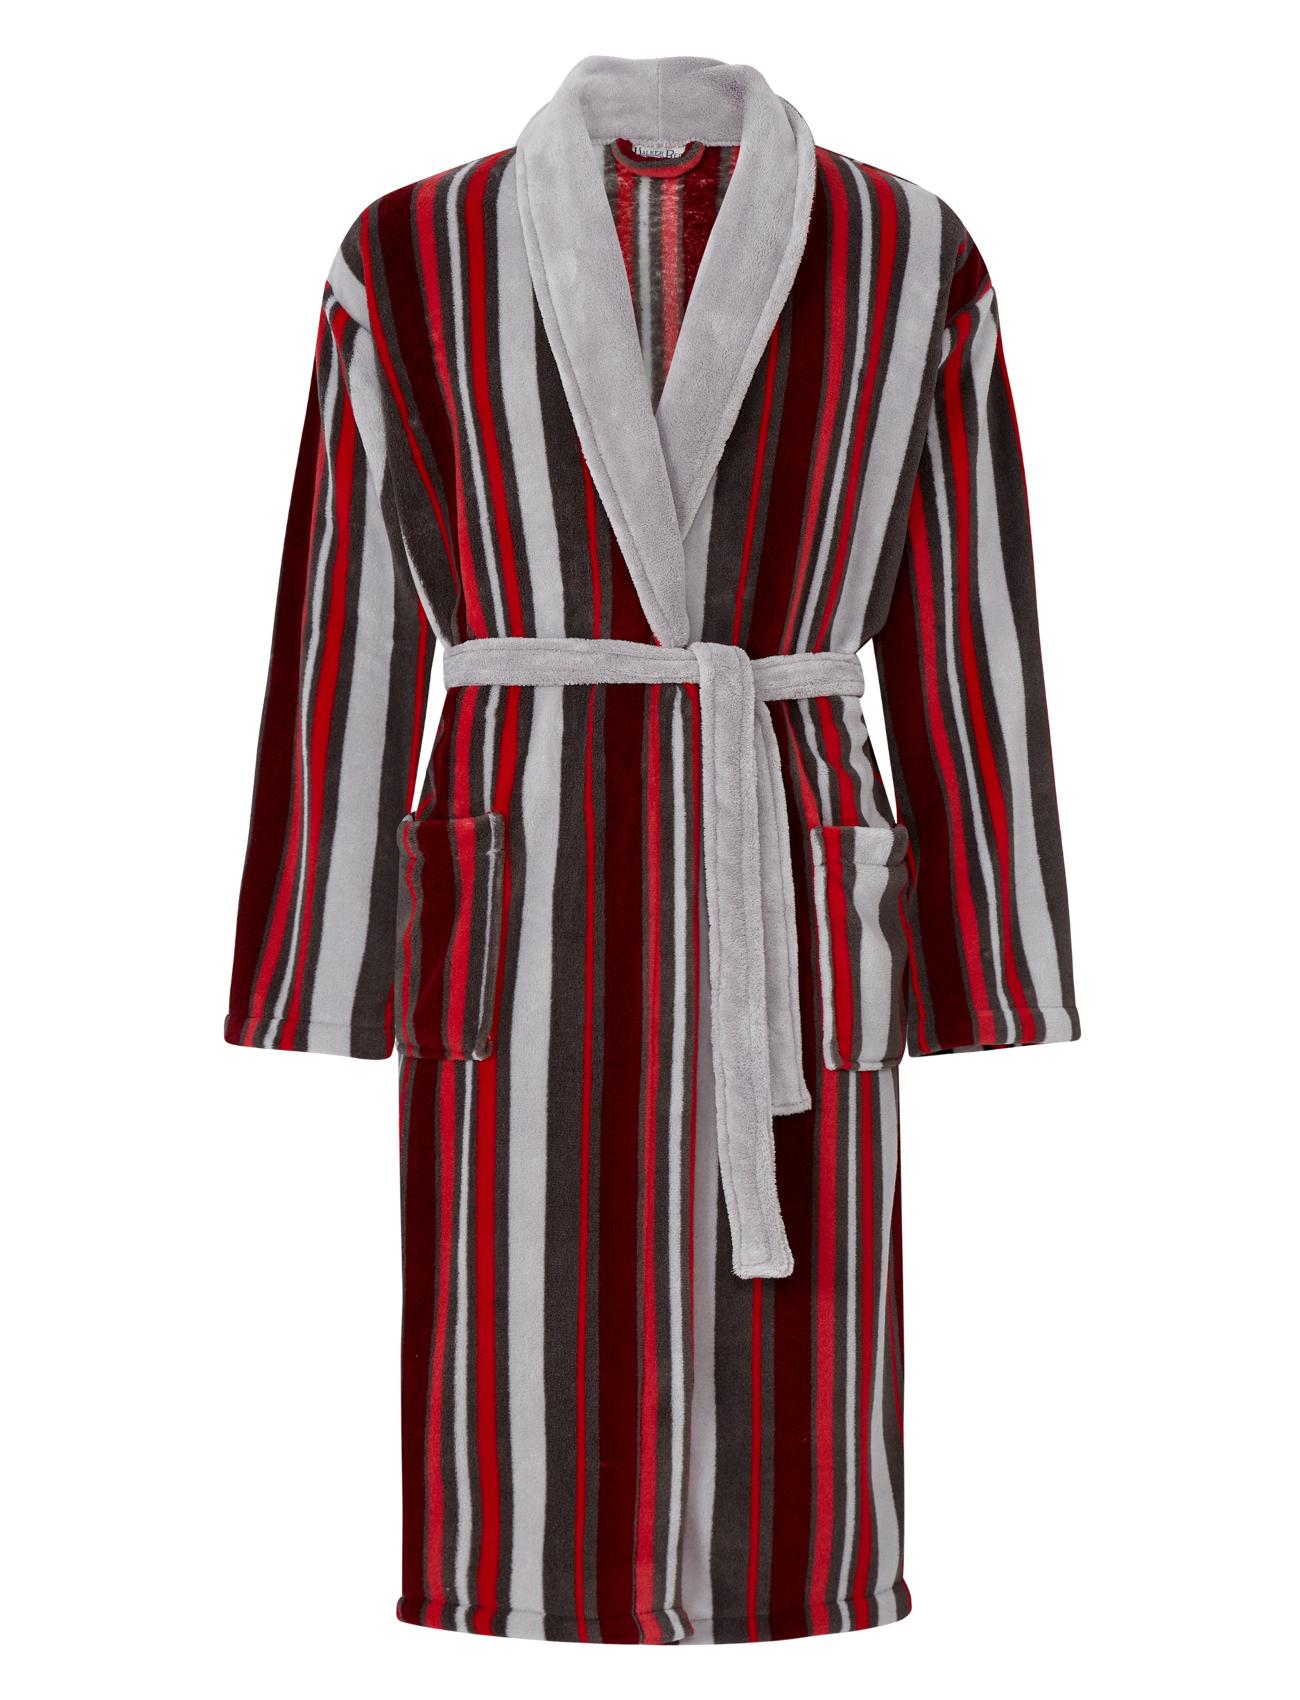 robe de chambre homme polaire rayures peignoir luxe walker reid nightwear robe ebay. Black Bedroom Furniture Sets. Home Design Ideas